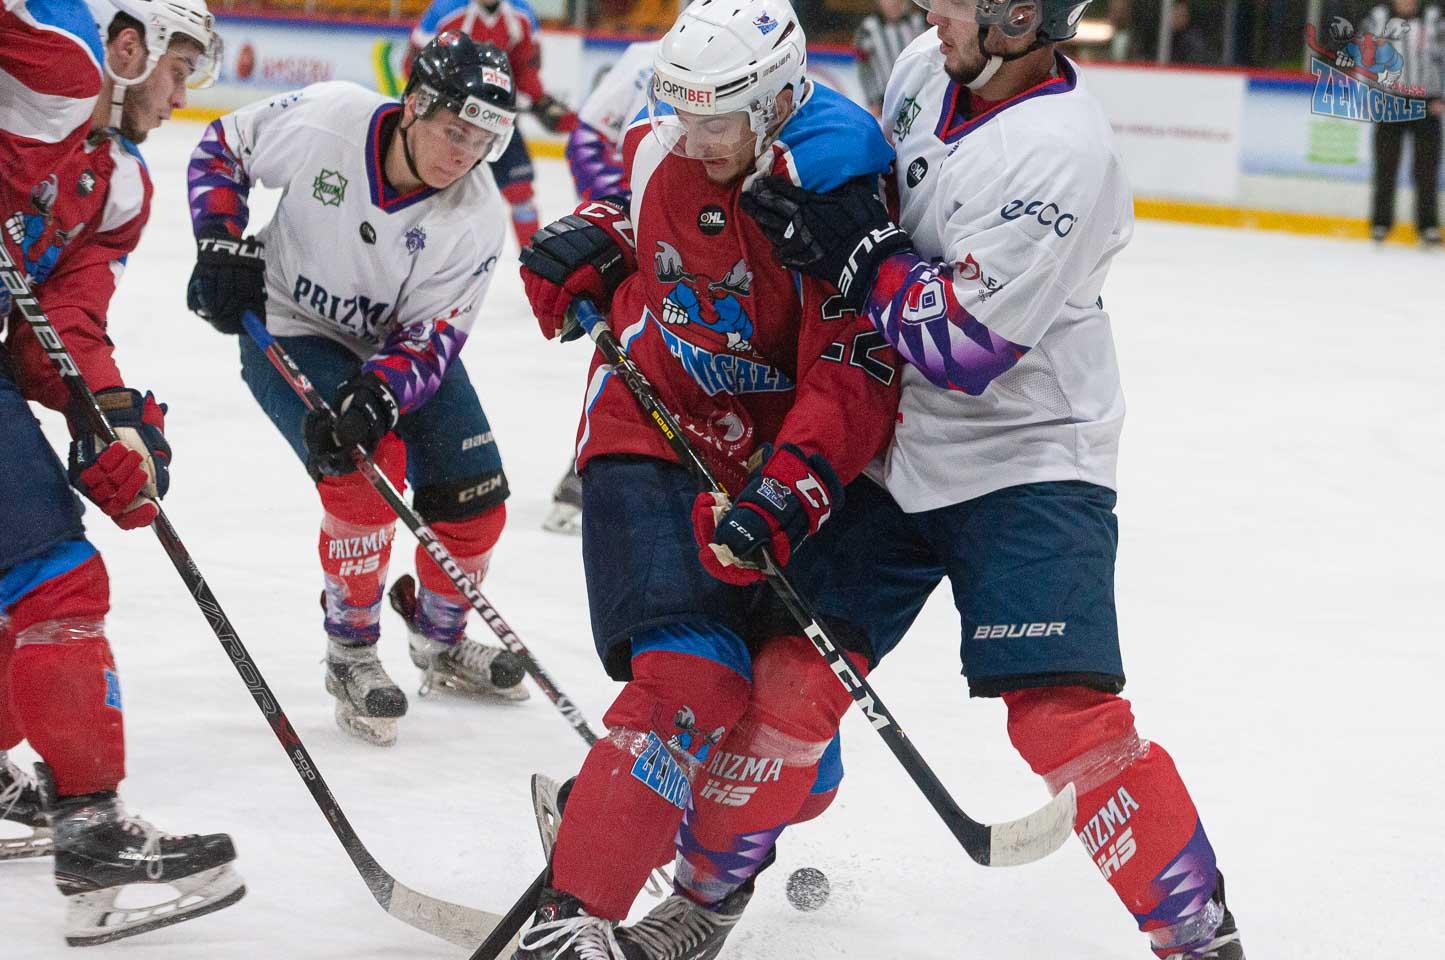 Hokejistu sadursme uz ledus